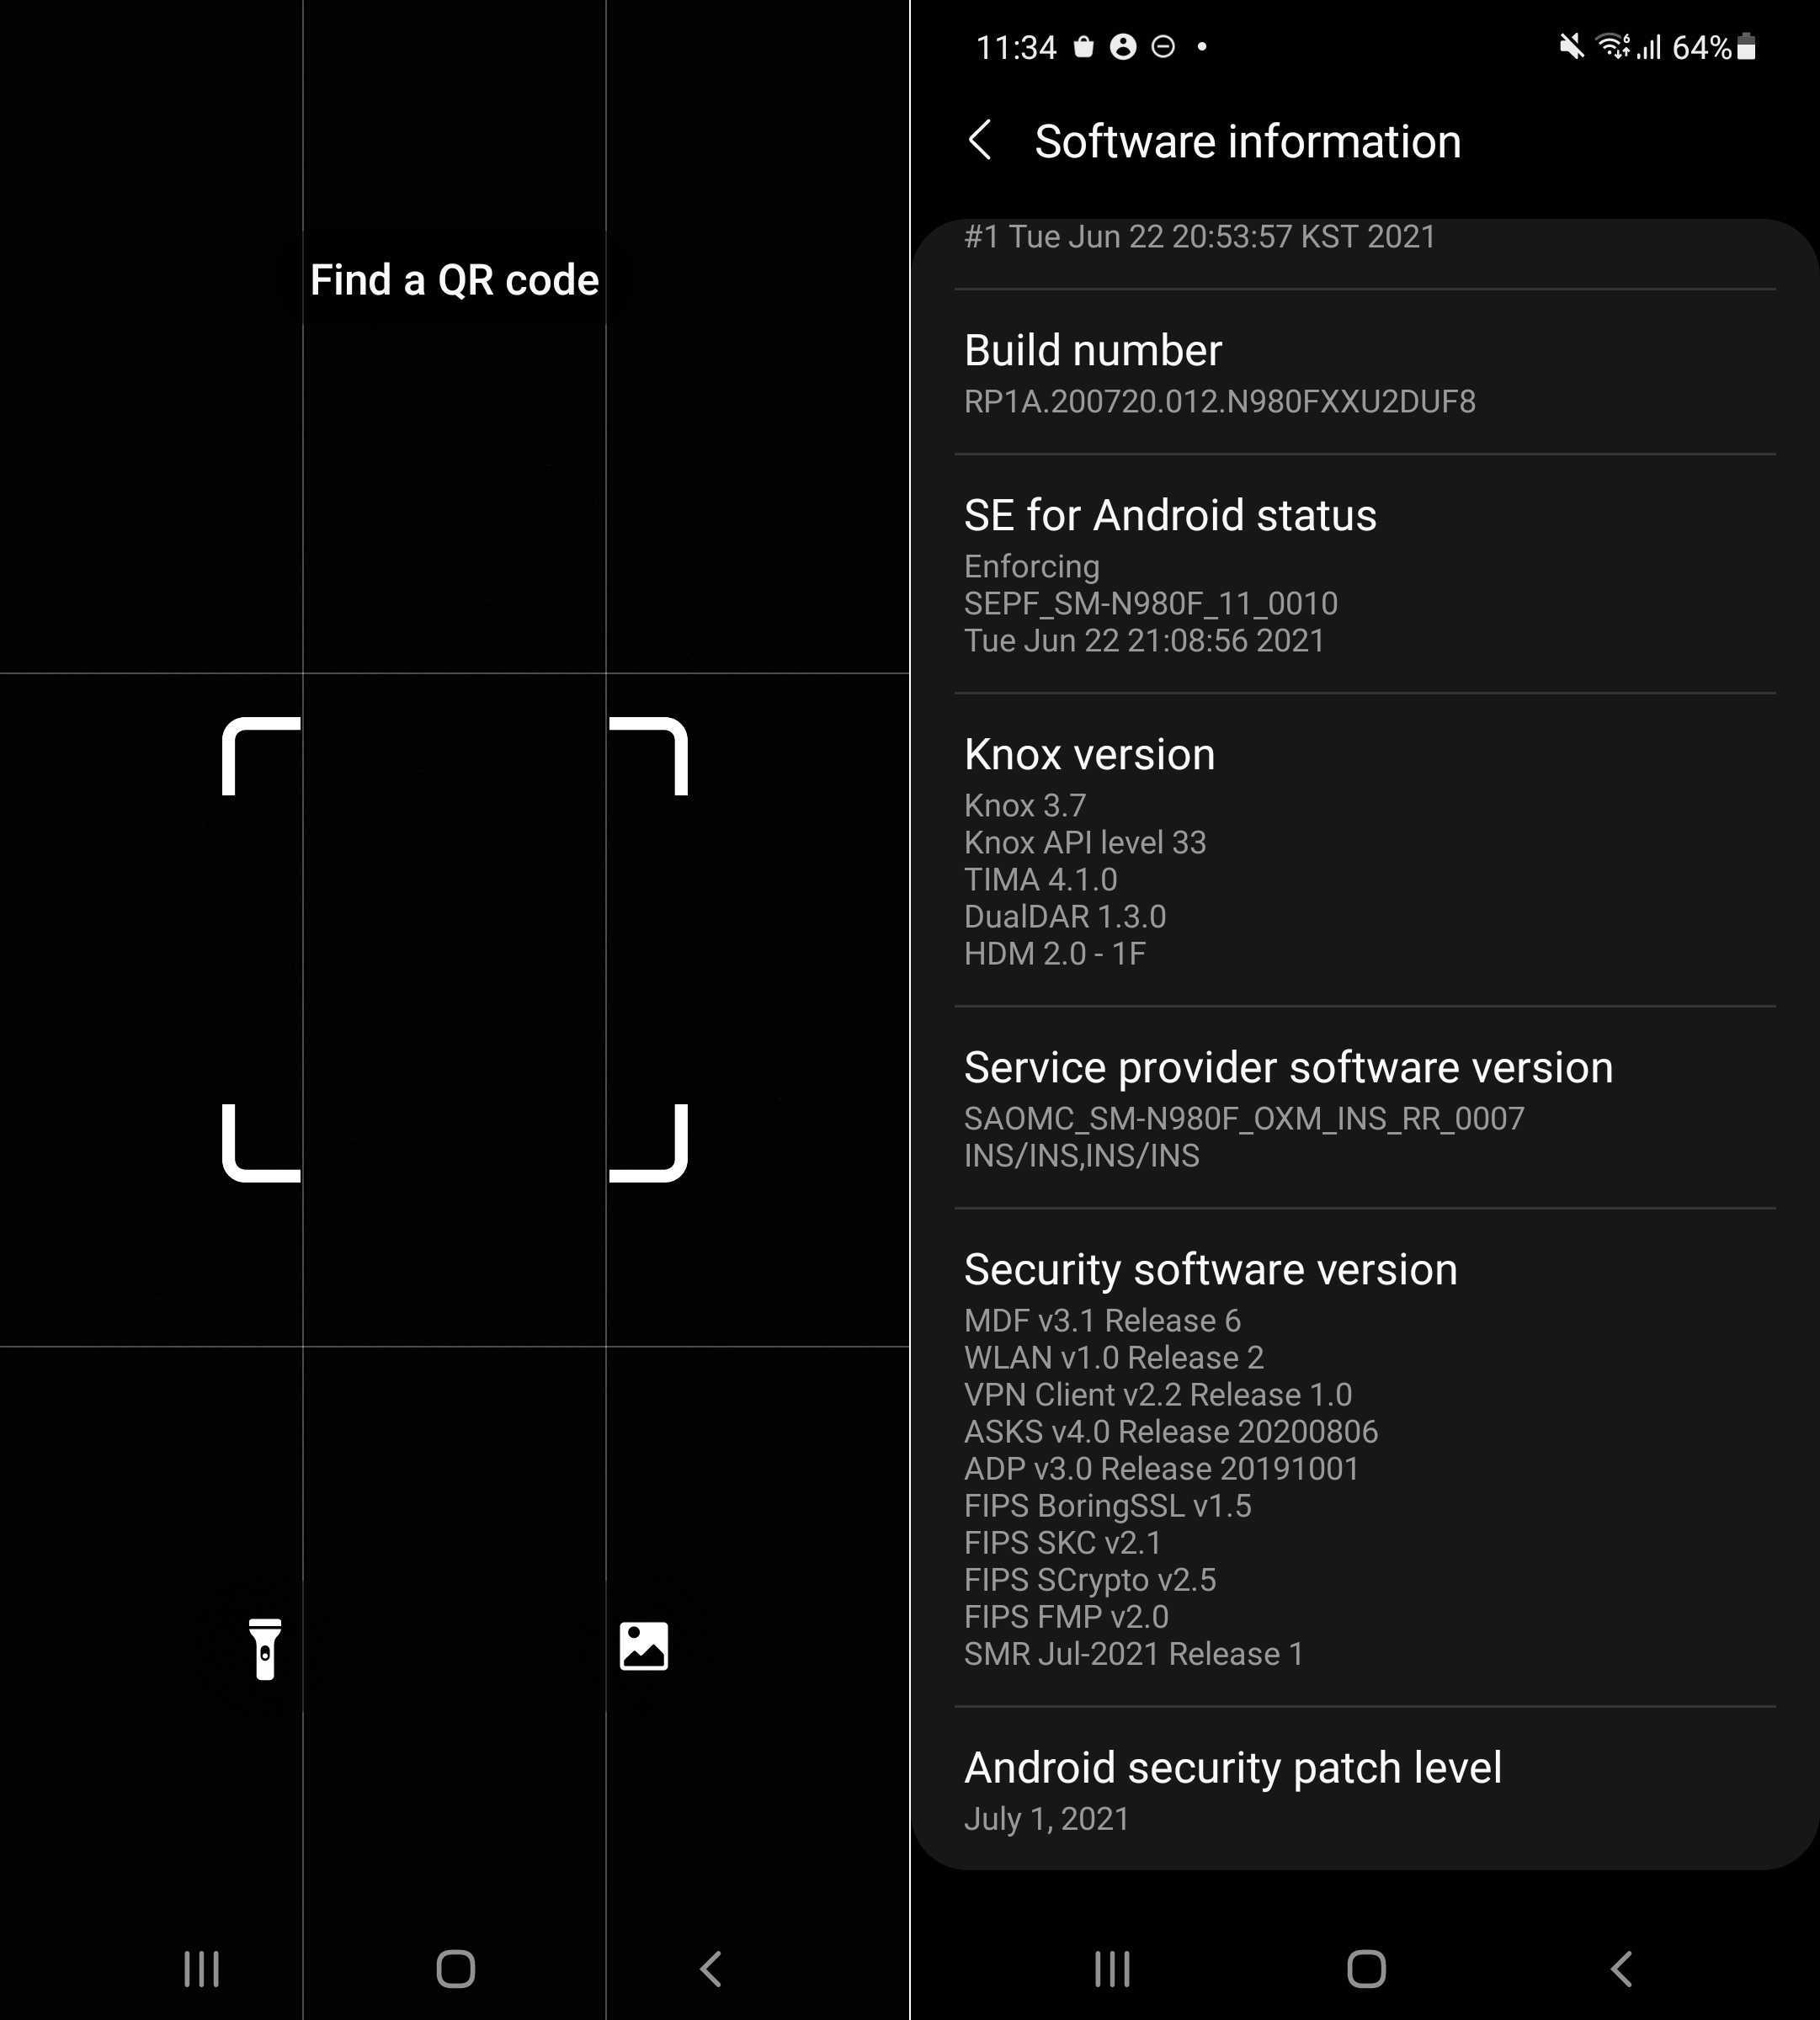 Galaxy Note 20 July 2021 update